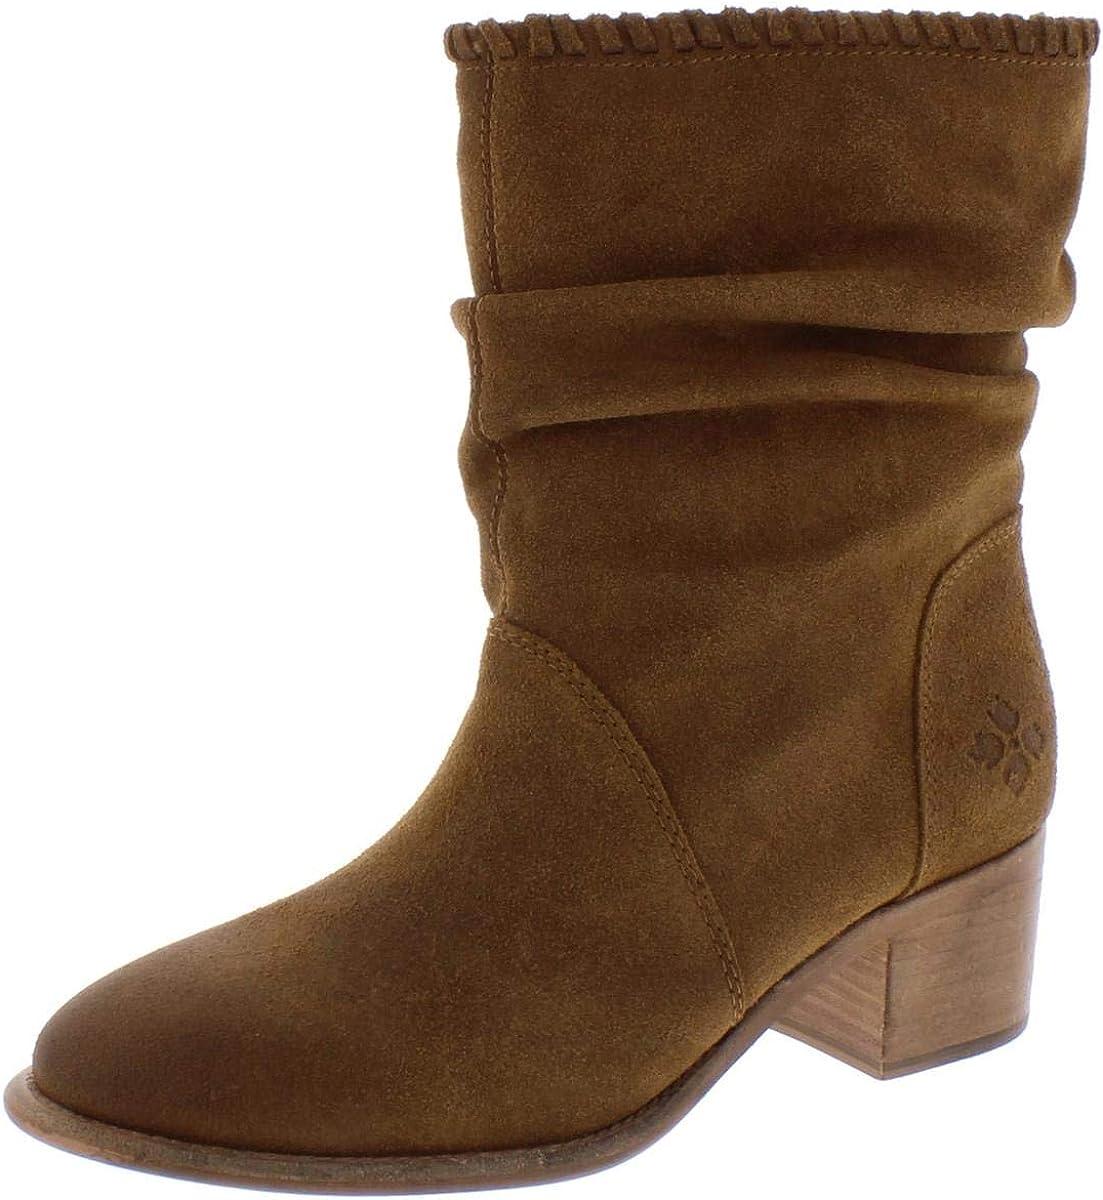 Patricia Nash Womens Monte2 Fabric Closed Toe Mid-Calf Riding Boots